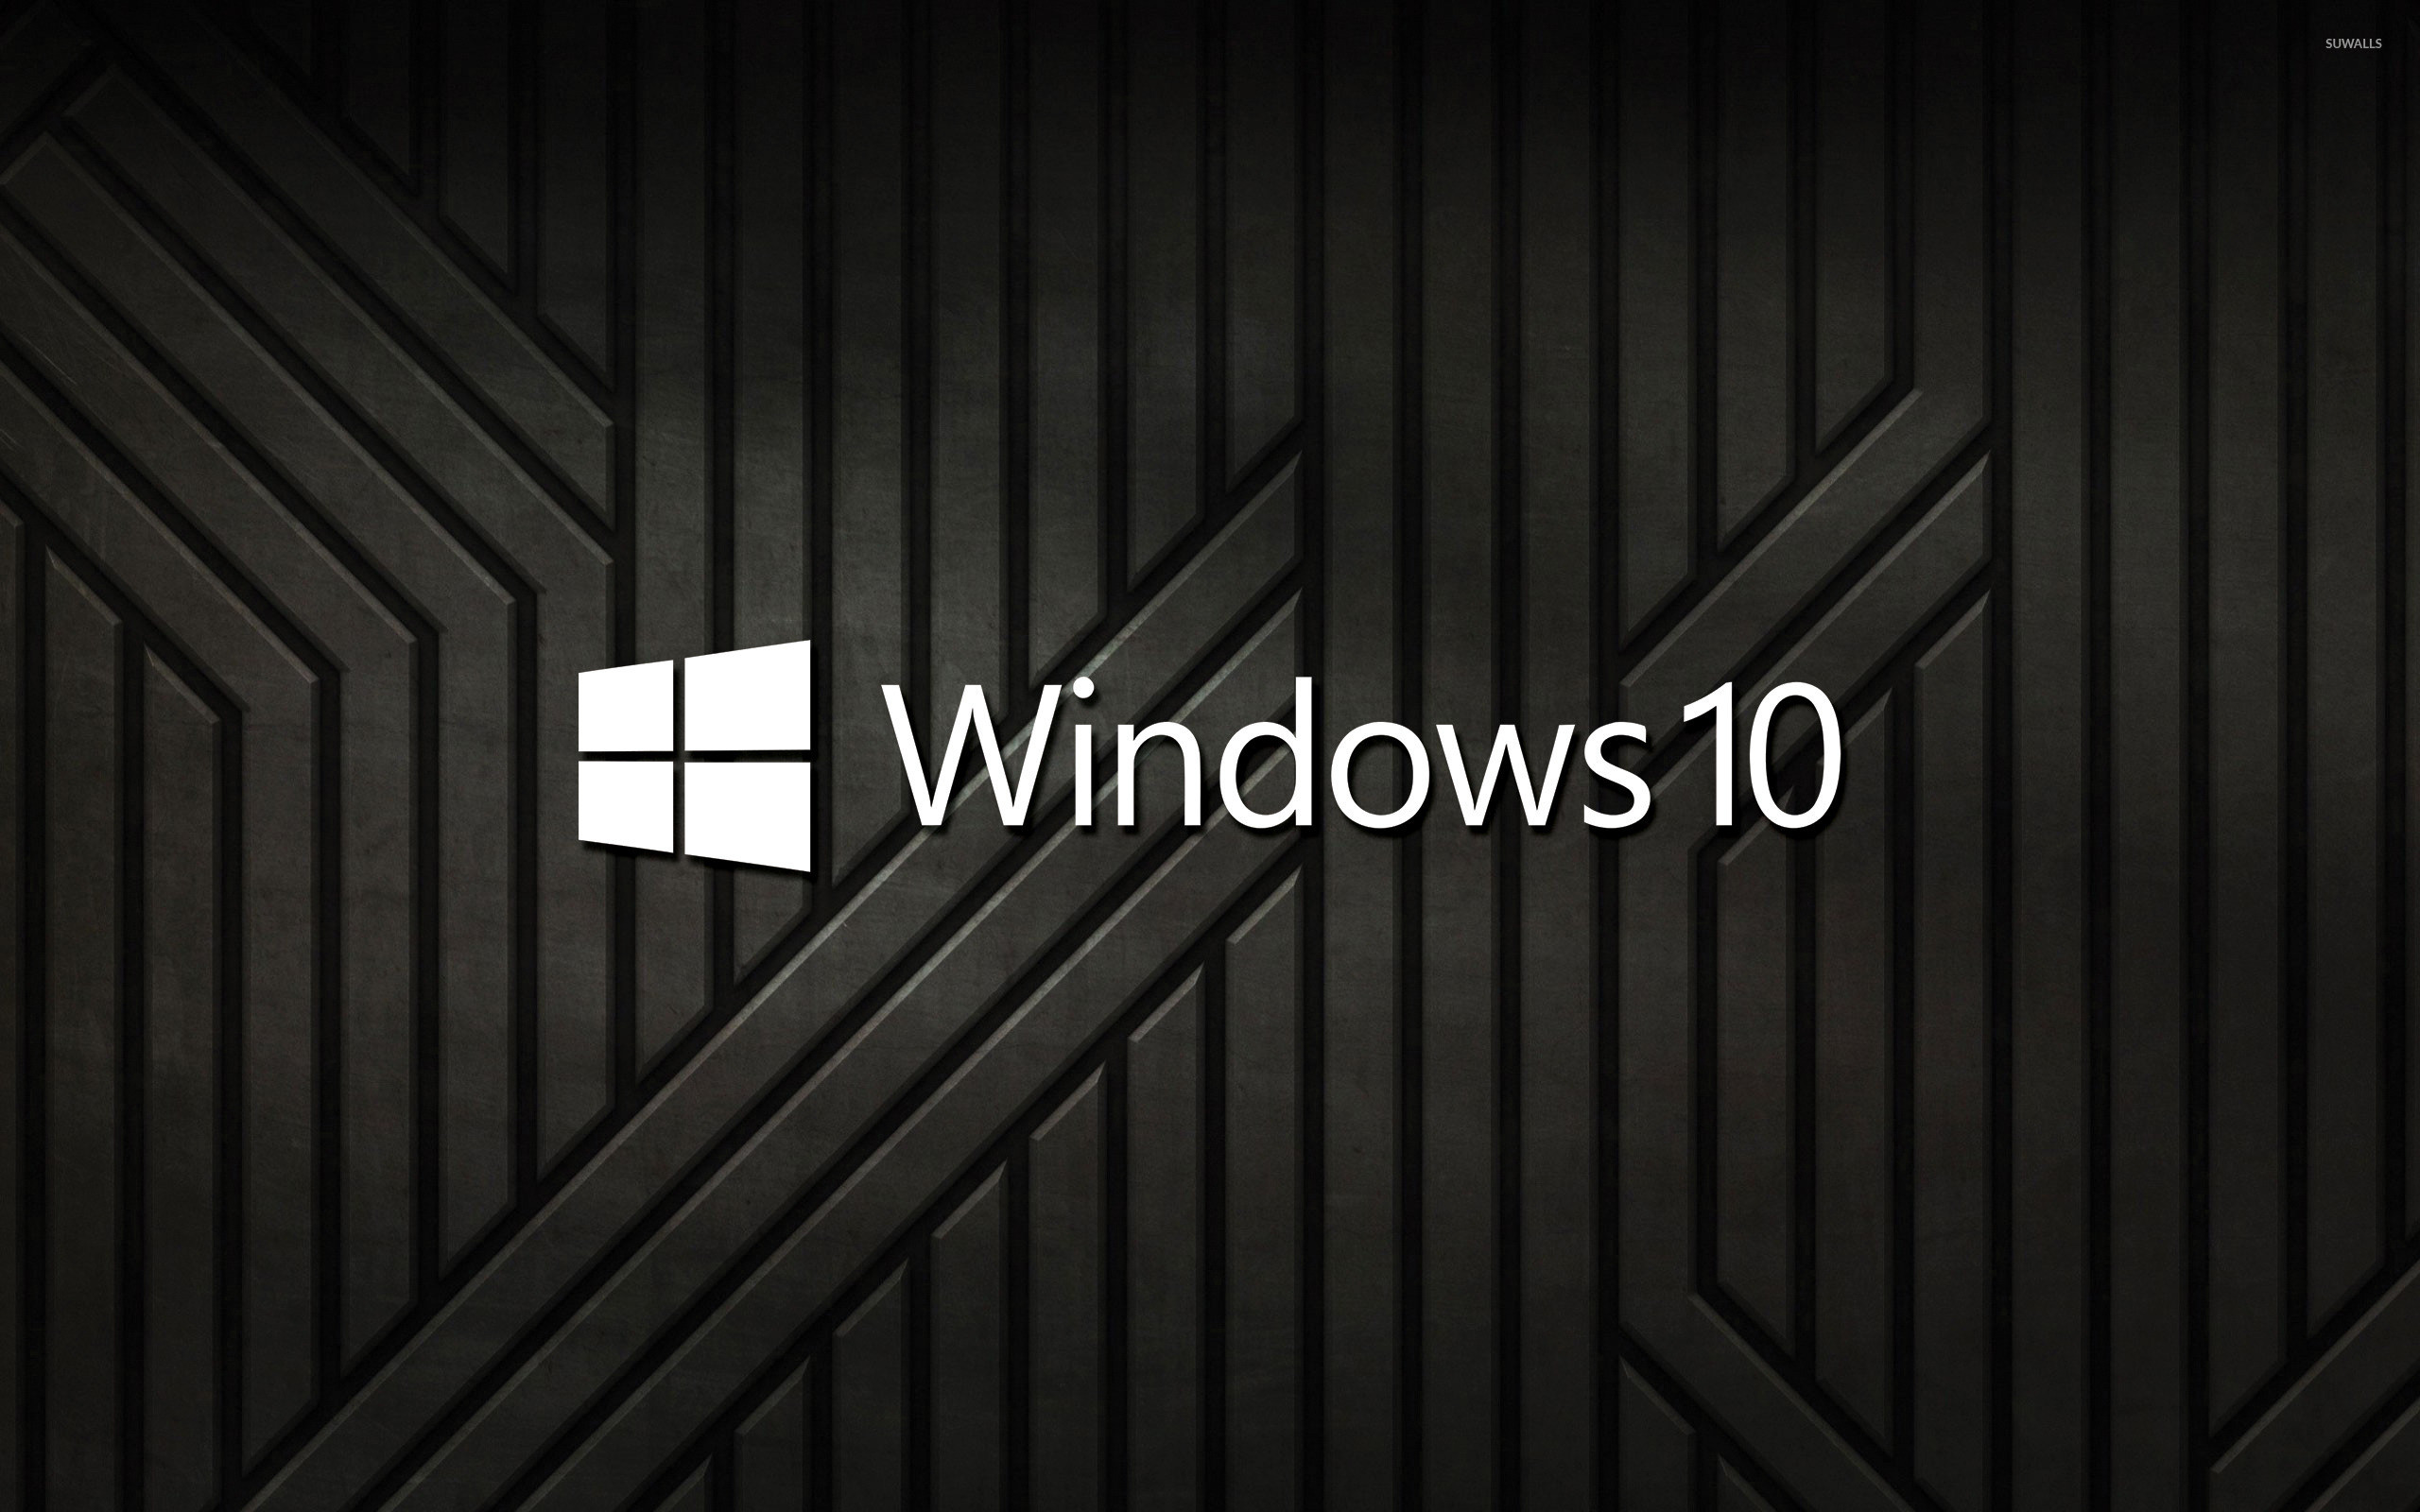 Windows 10 text logo on black metal stripes wallpaper jpg